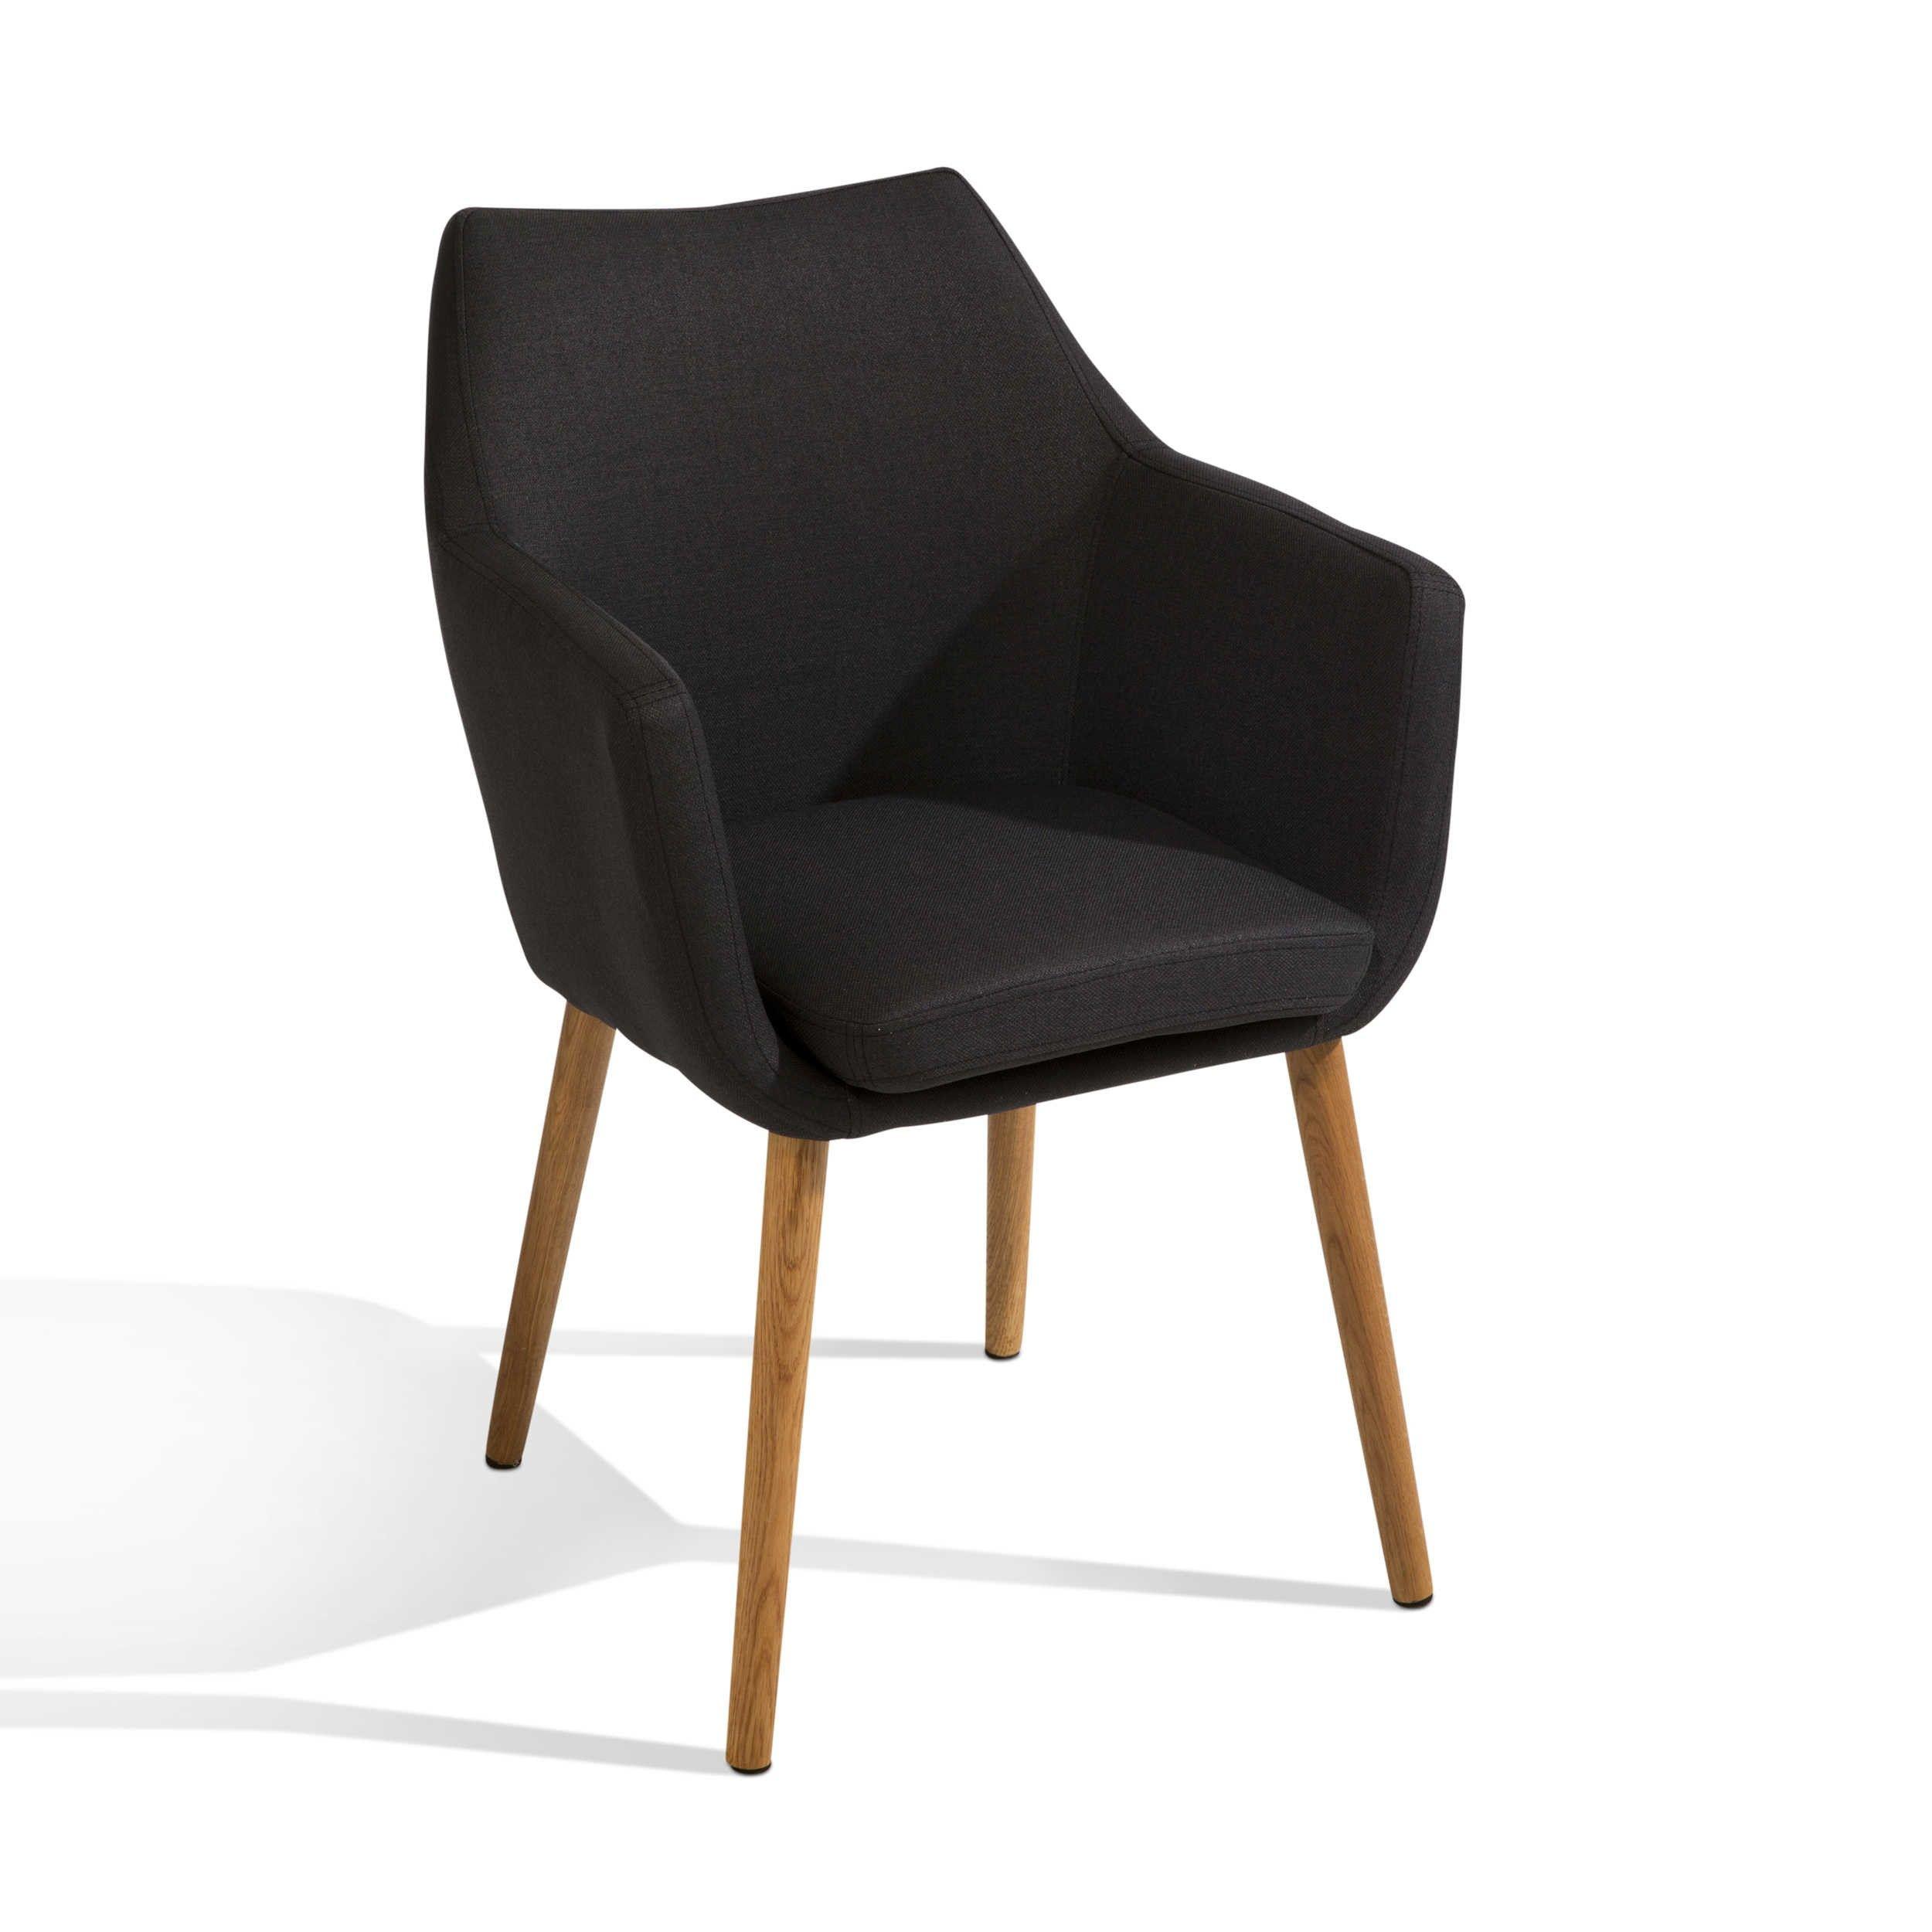 Stuhl Petrulli 4 Fuß Stühle Stühle & Freischwinger